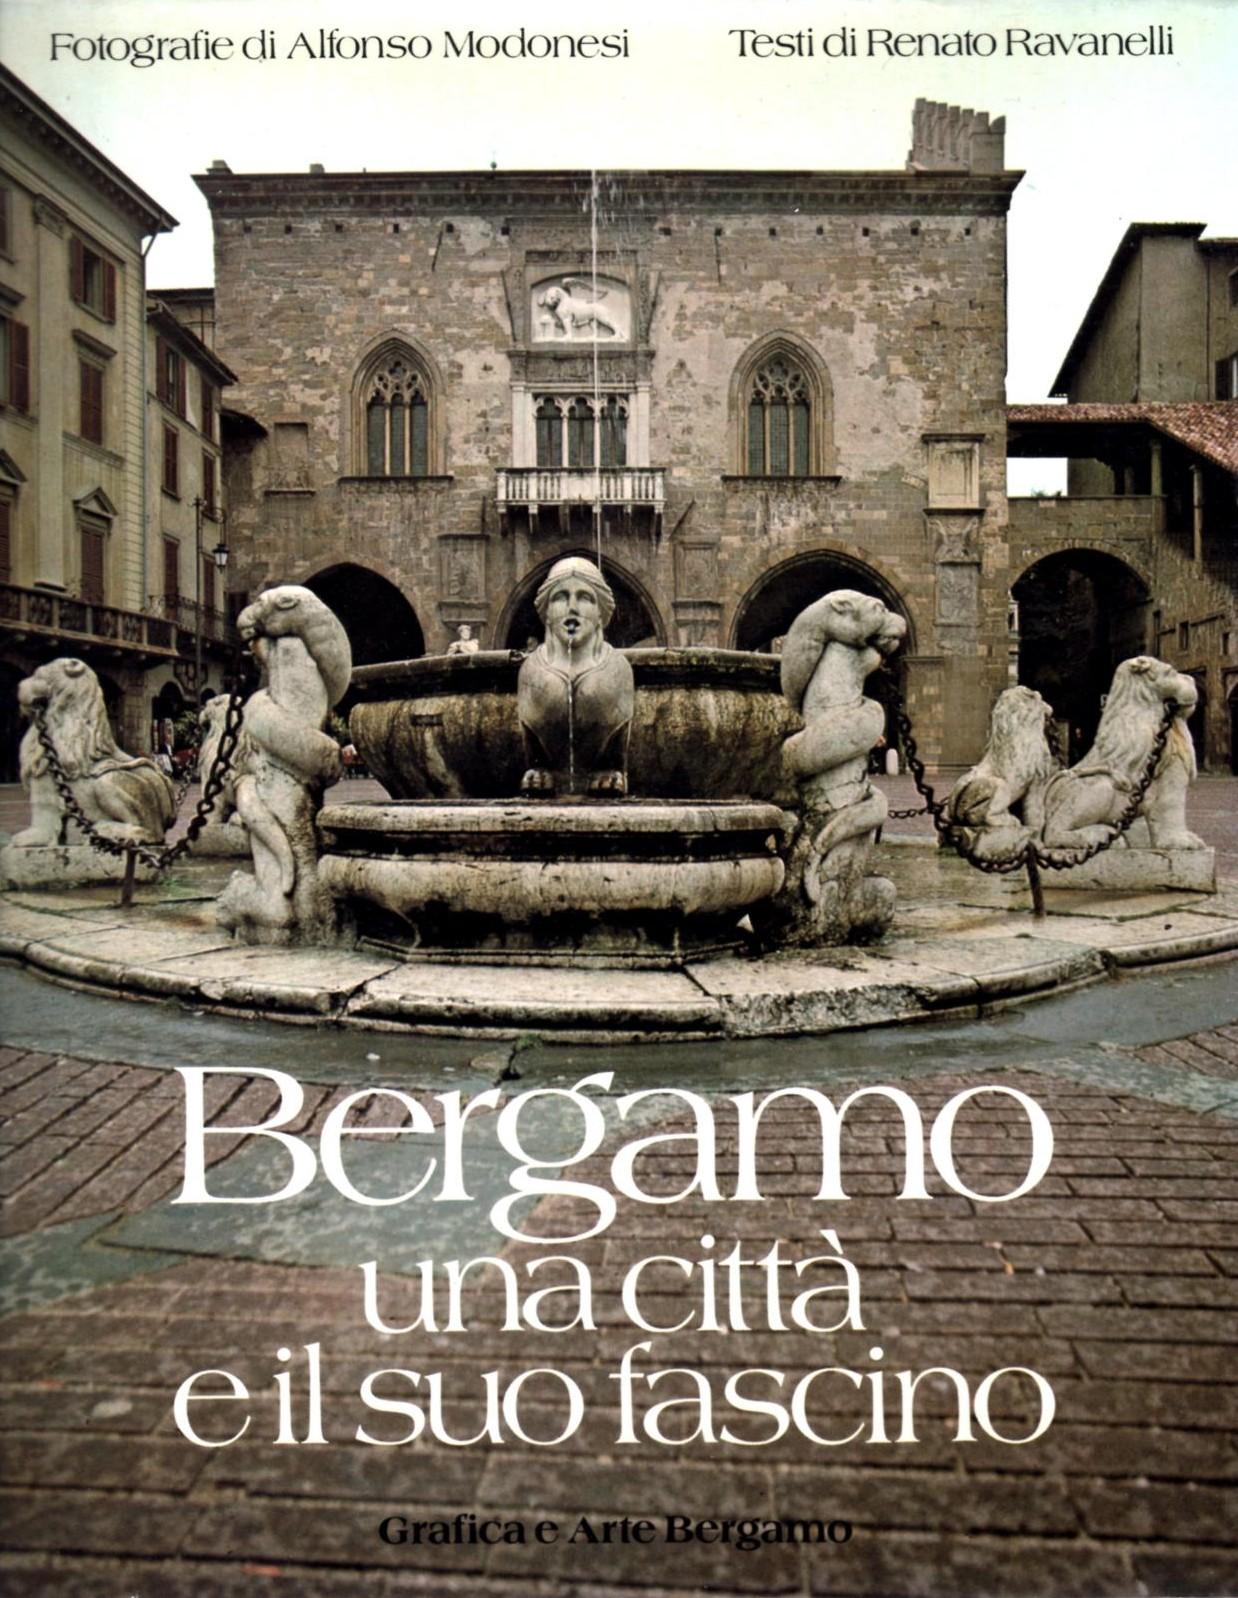 36 - Bergamo fascino